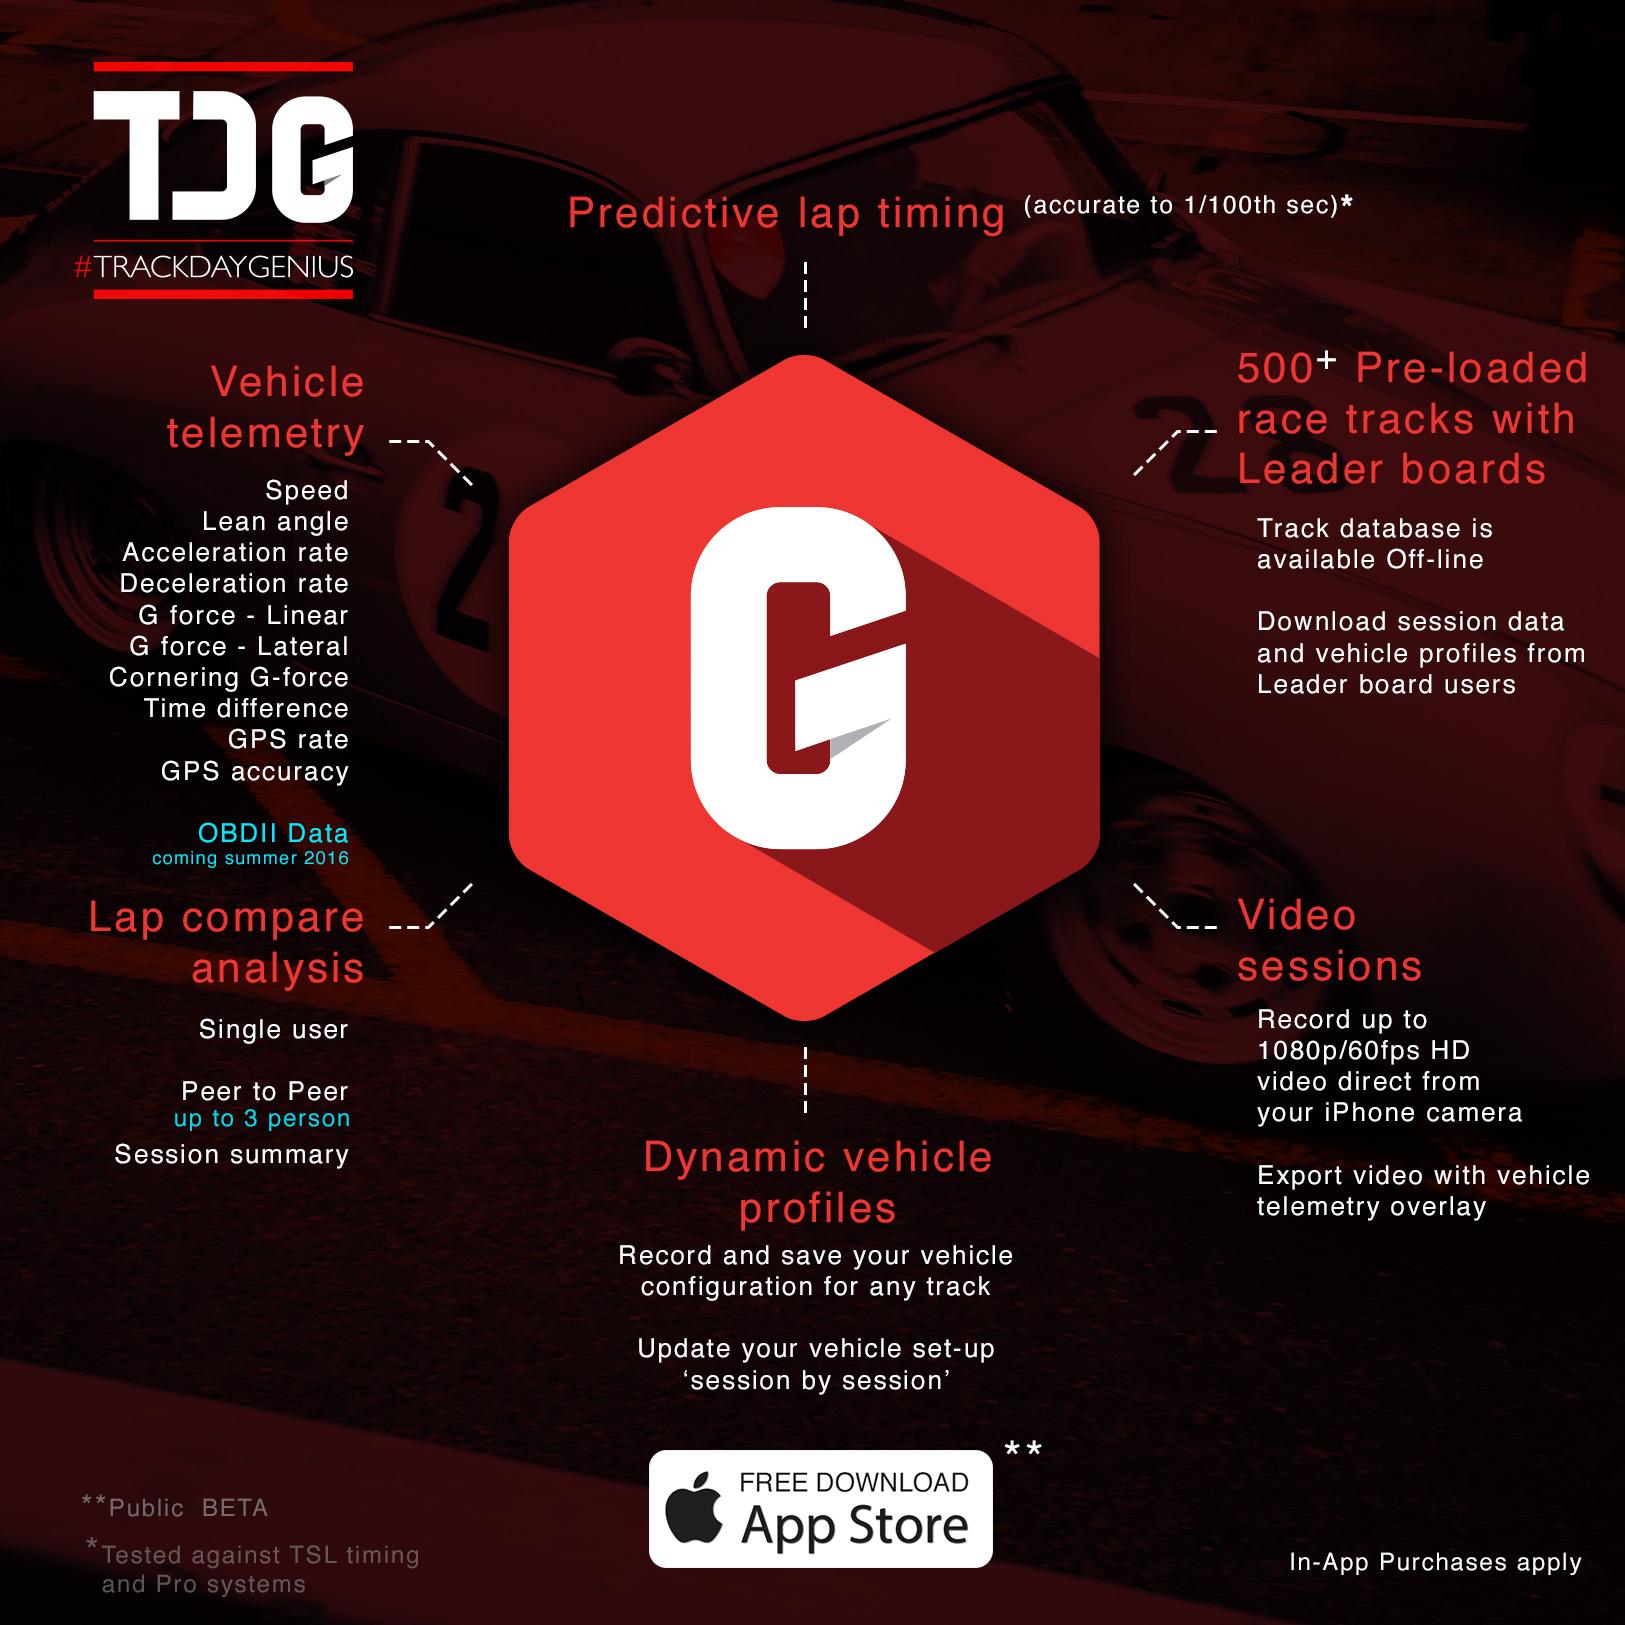 tdg-geniusOverview-sq